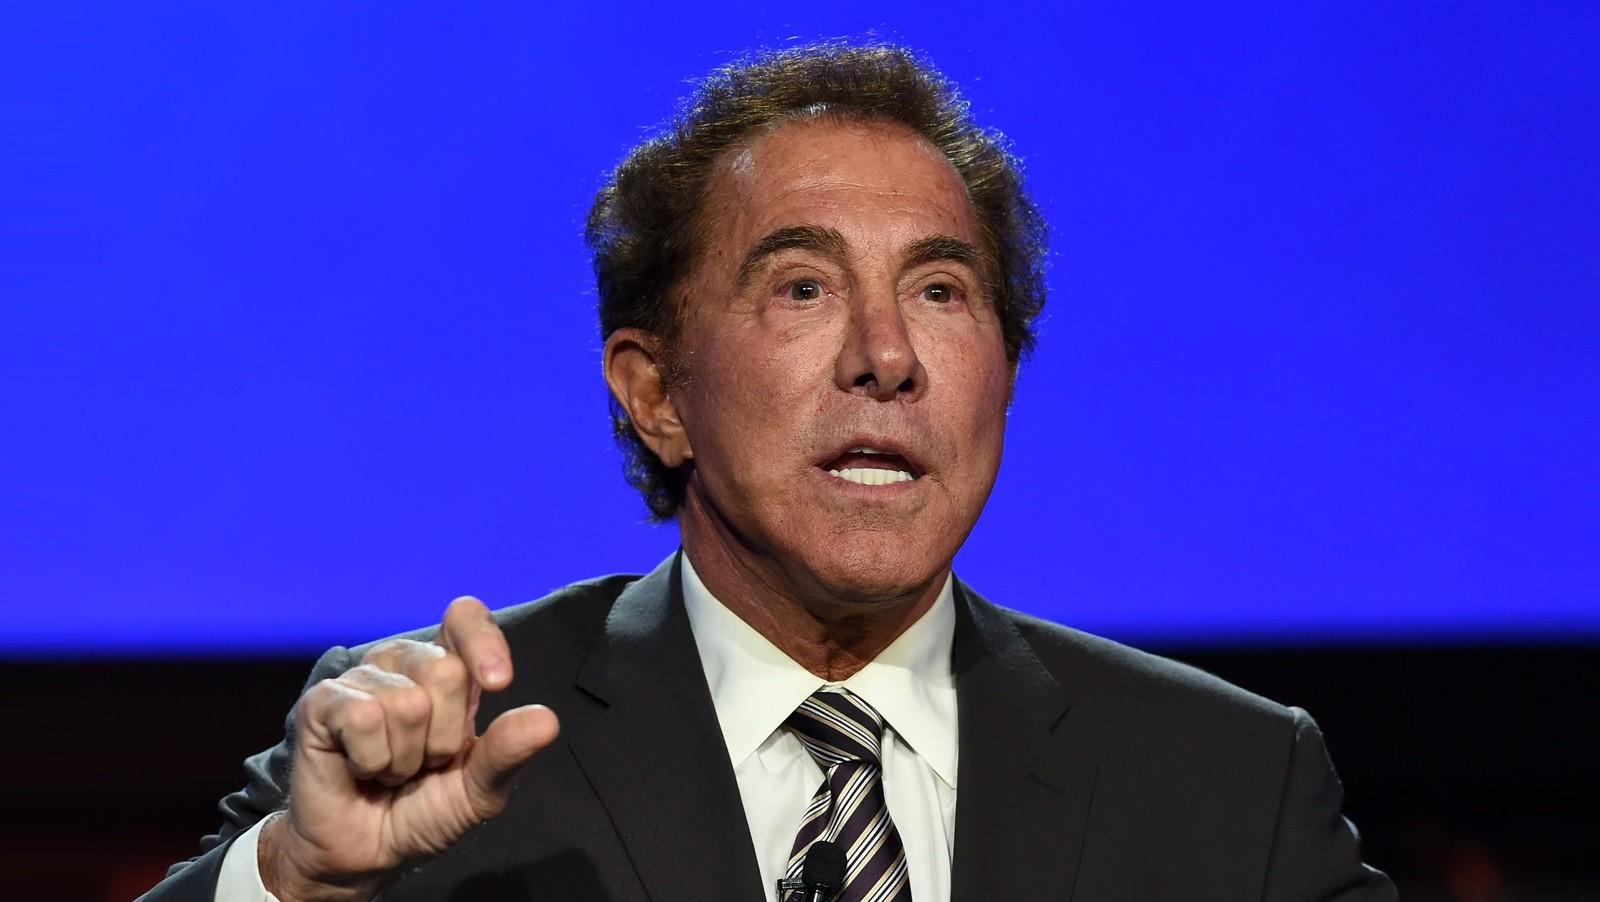 It's his turn: Steve Wynn sues ex-casino worker for defamation